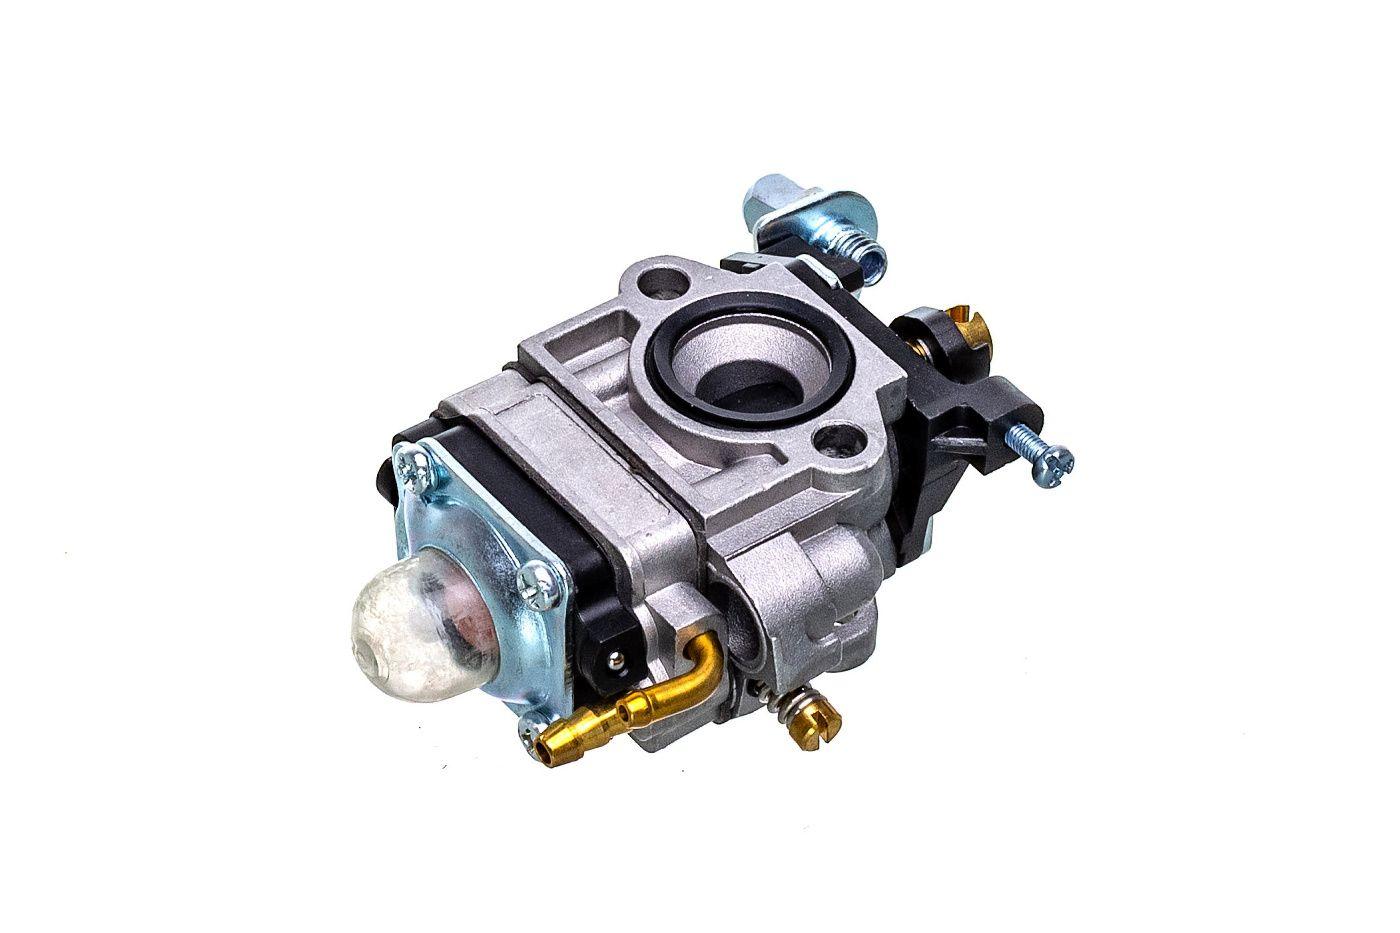 Karburátor ECHO SRM 2601, AL-KO BC4535, BC4125, BC410, HECHT, ČÍNSKÉ KŘOVINOŘEZY